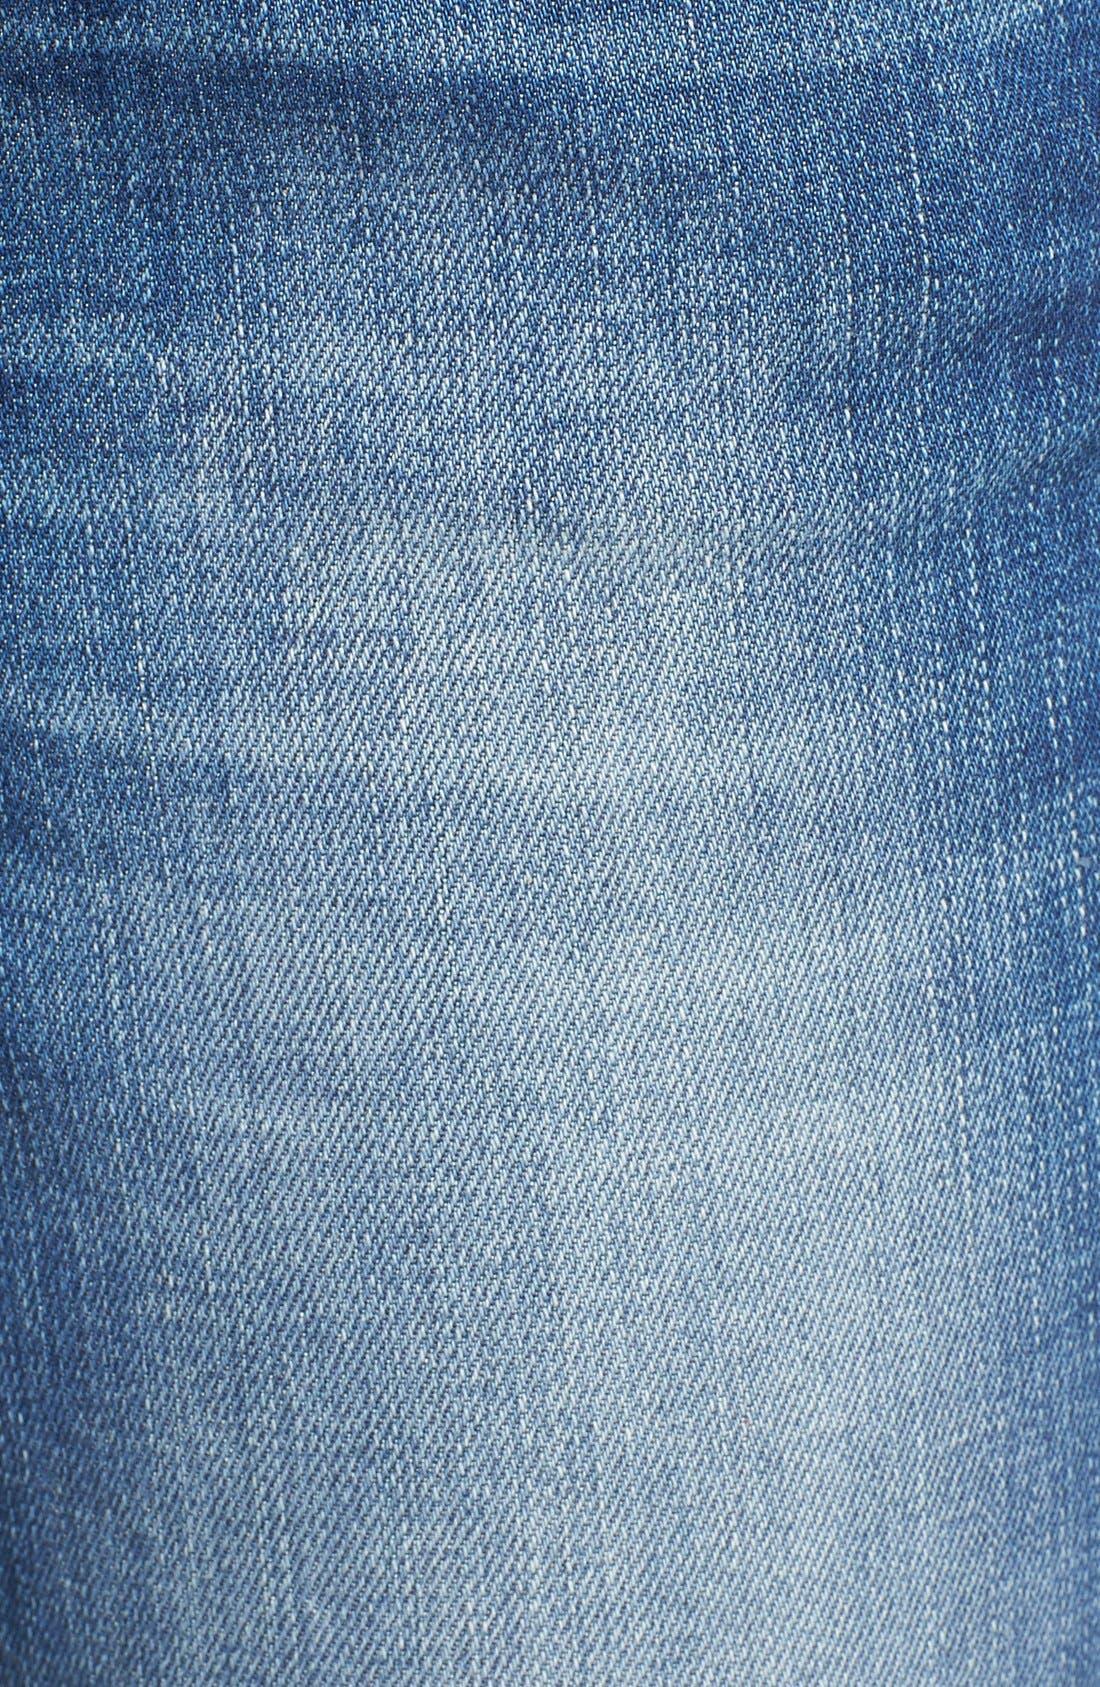 Alternate Image 5  - Mavi Jeans 'Emma' Stretch Slim Boyfriend Jeans (Shaded Vintage)